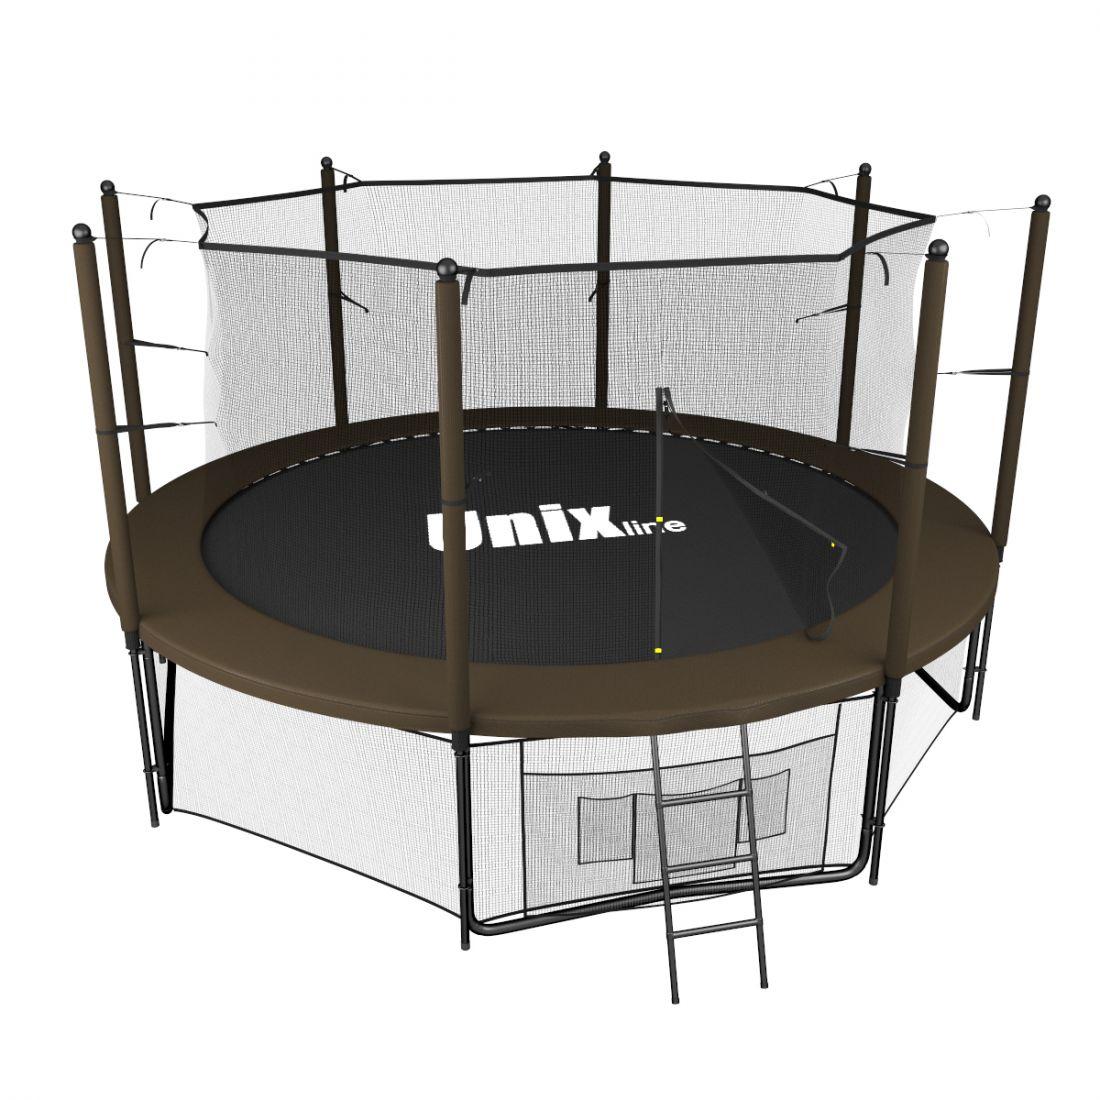 Батут UNIX line 12 ft (3.66 м, до 160 кг) Black&Brown (inside)